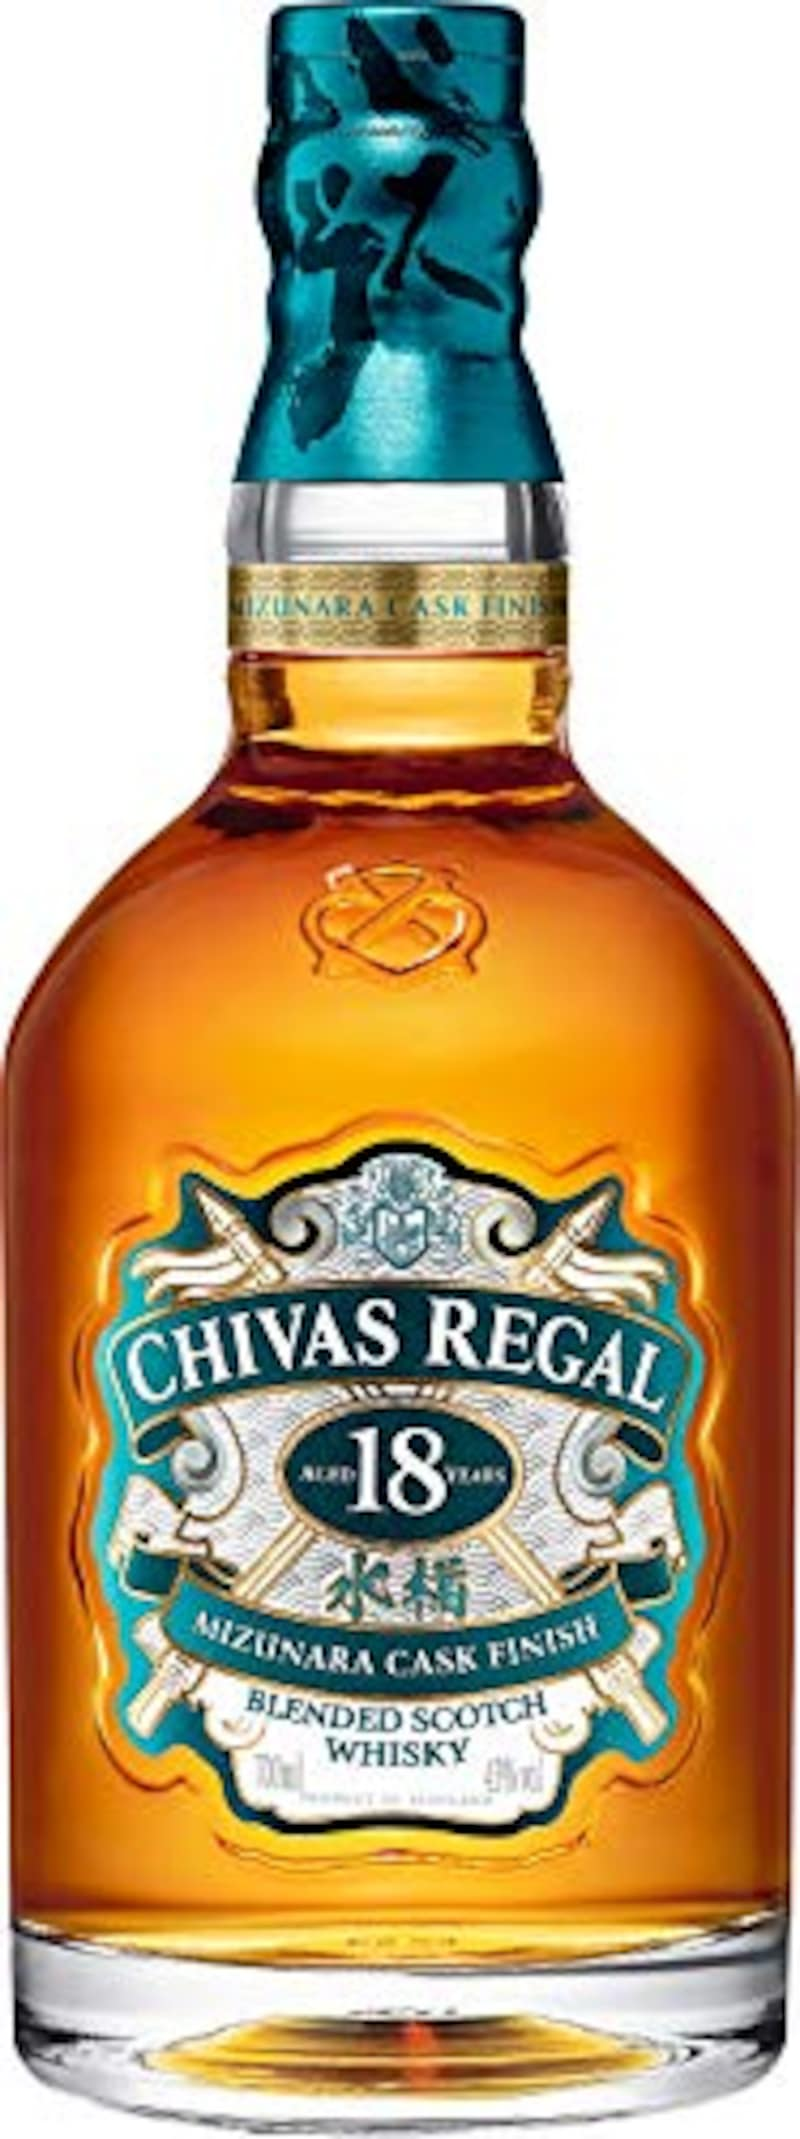 Chivas Regal (シーバスリーガル),シーバスリーガル 18 年 ミズナラ カスク フィニッシュ